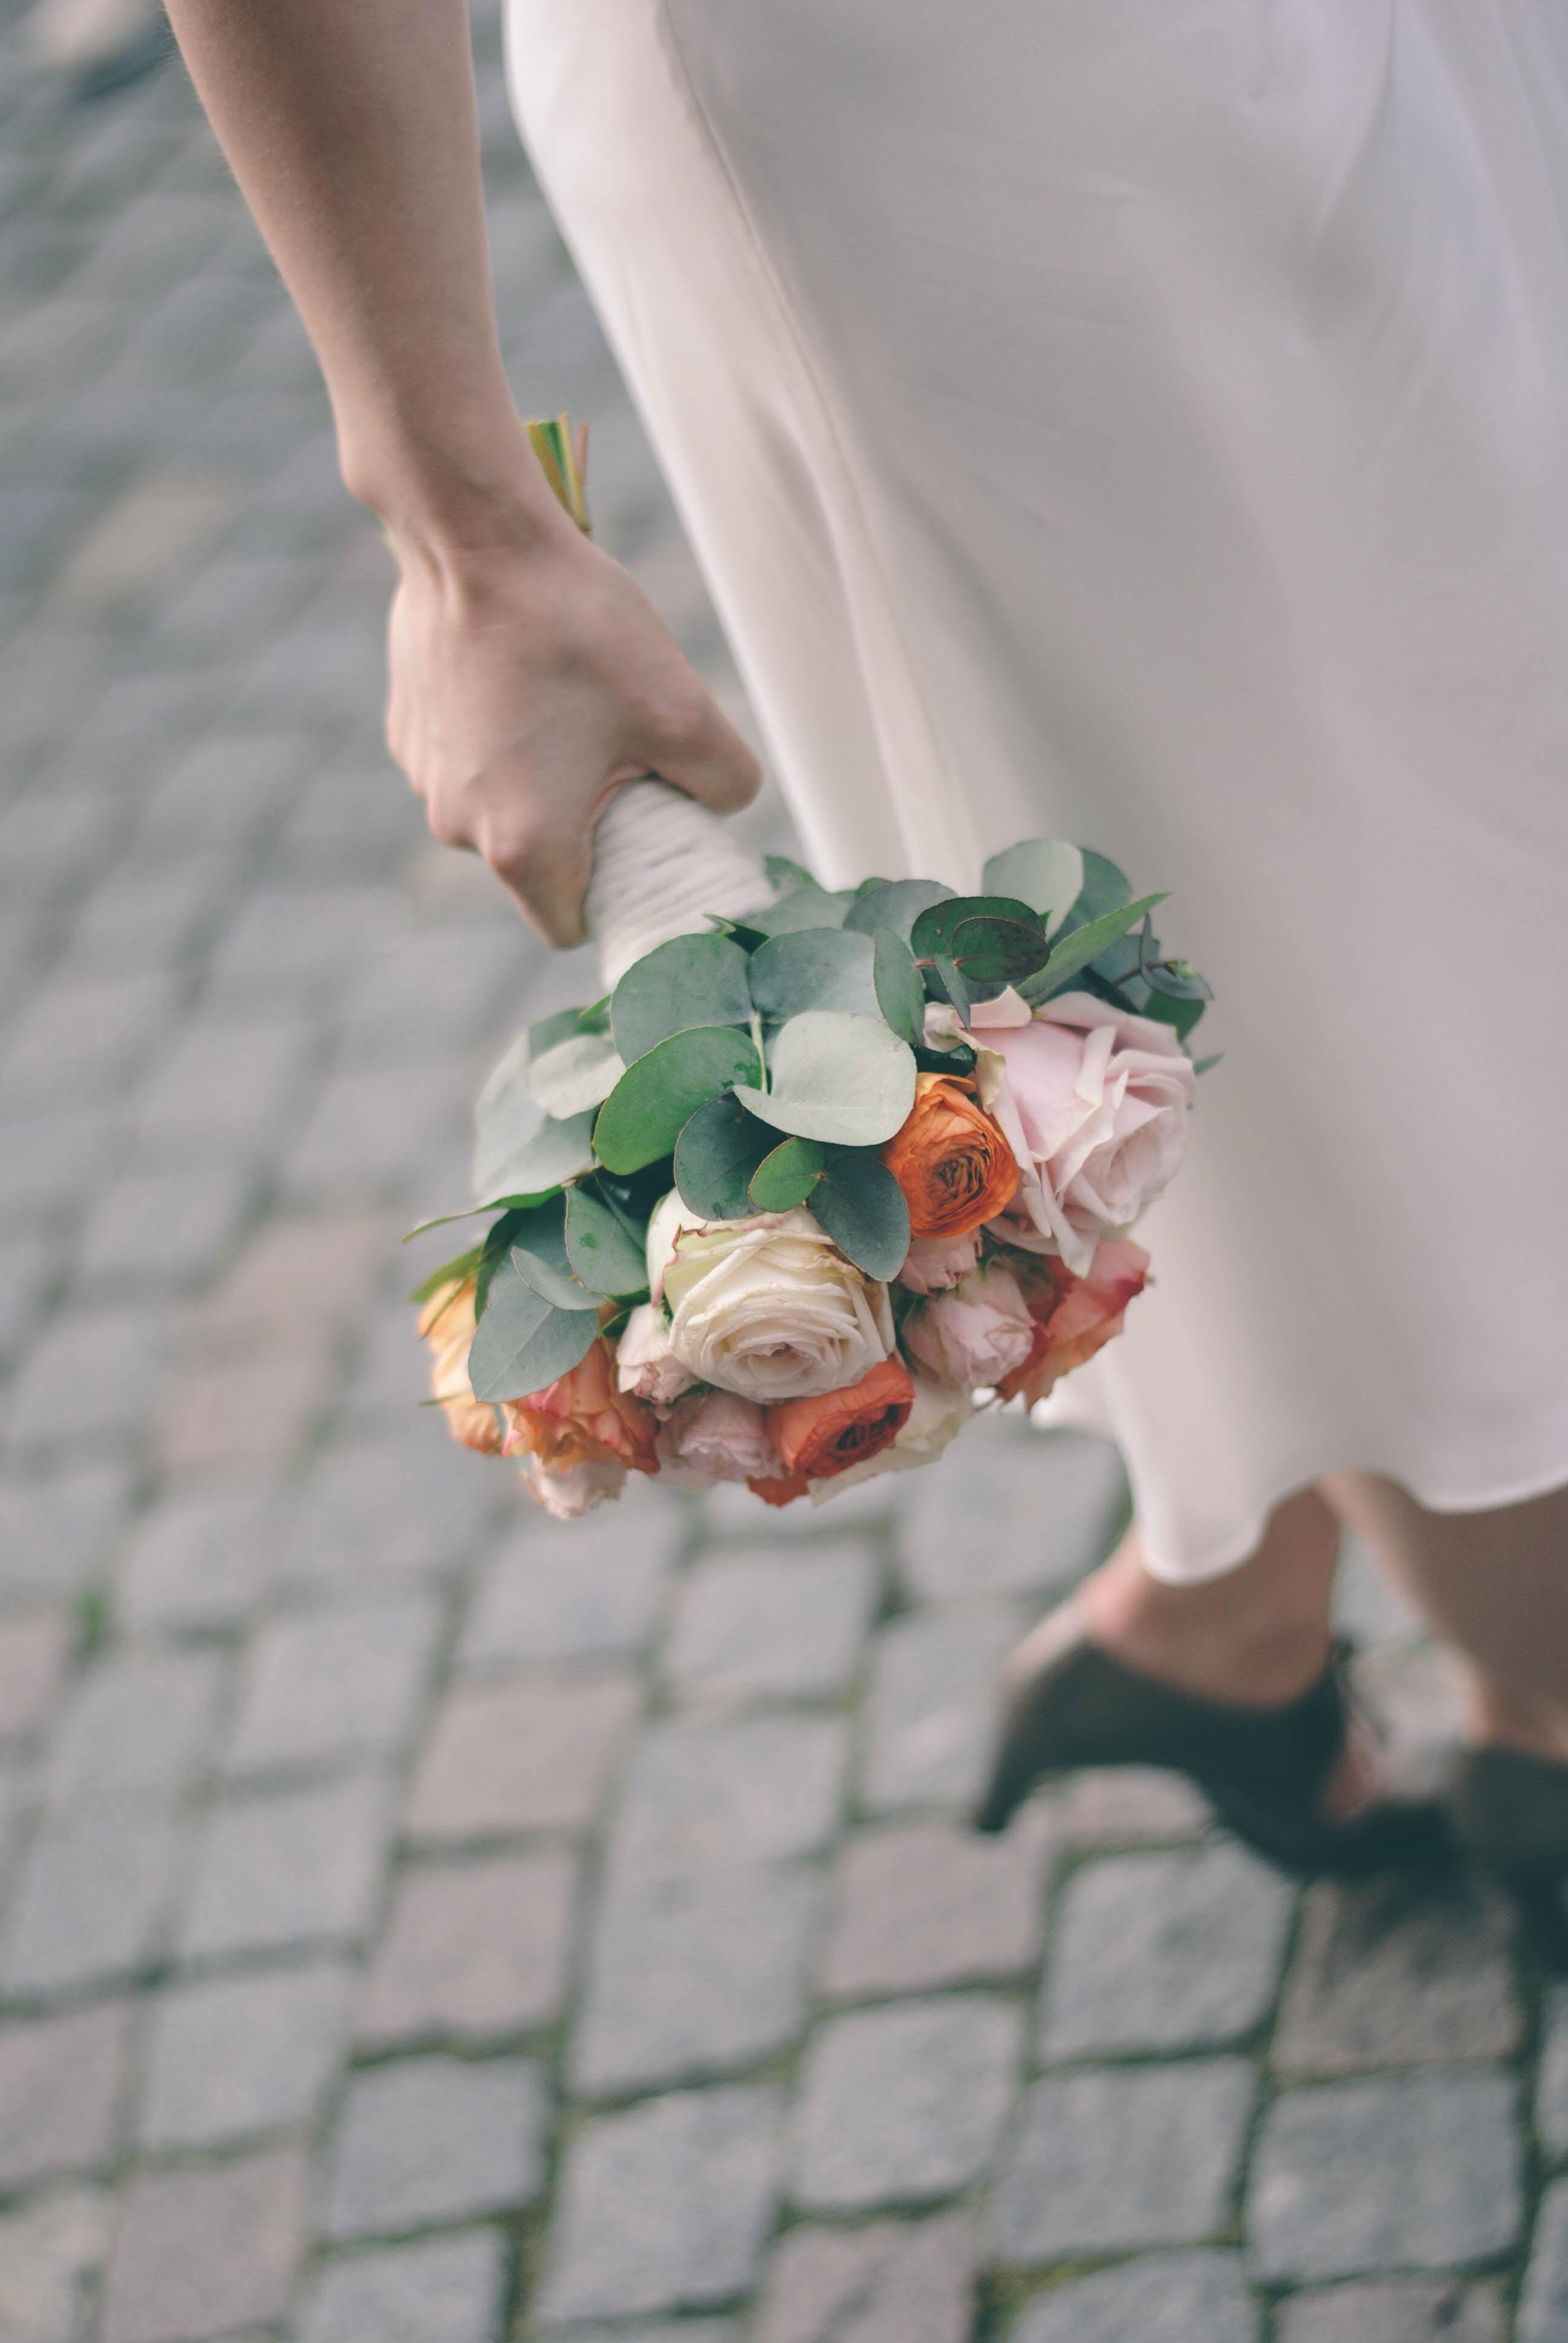 person holding flower arrangement